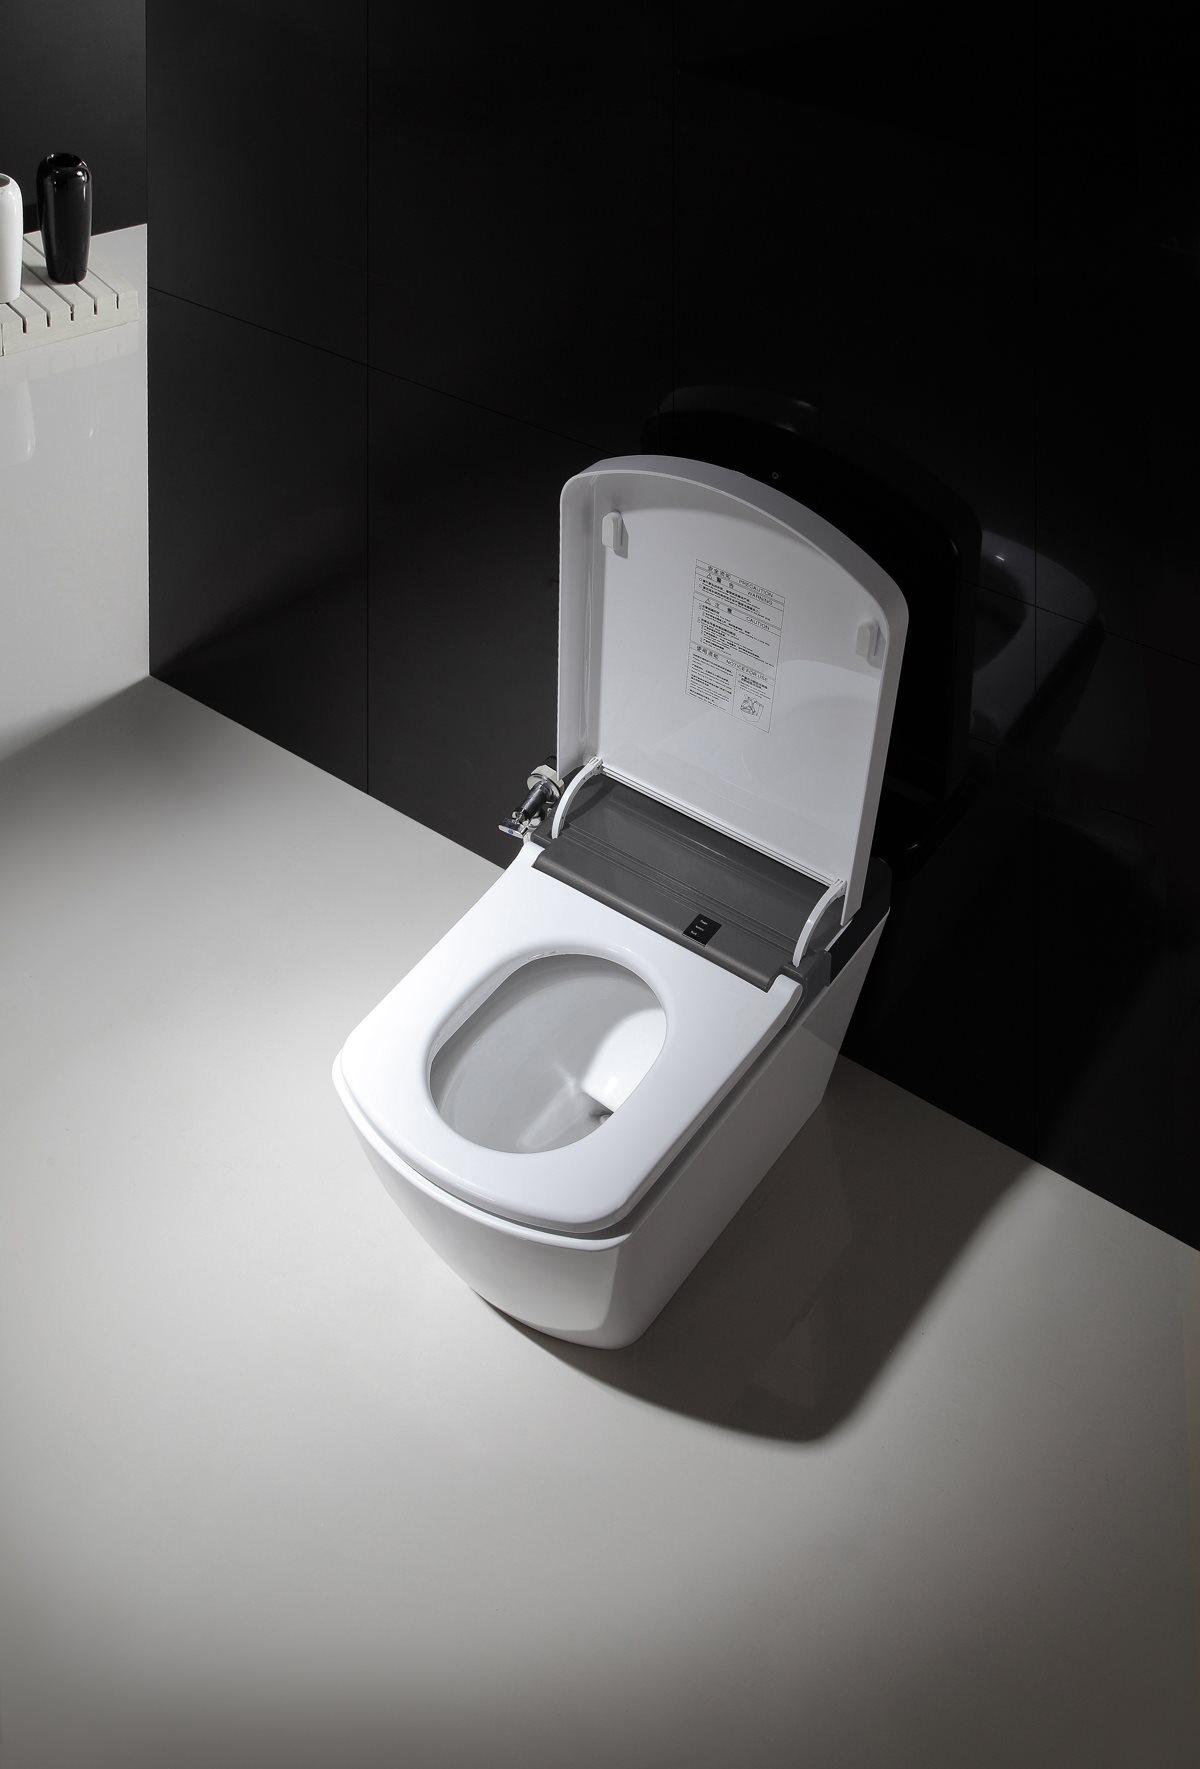 Chytrý záchod v nové sekci Alza Smarthome